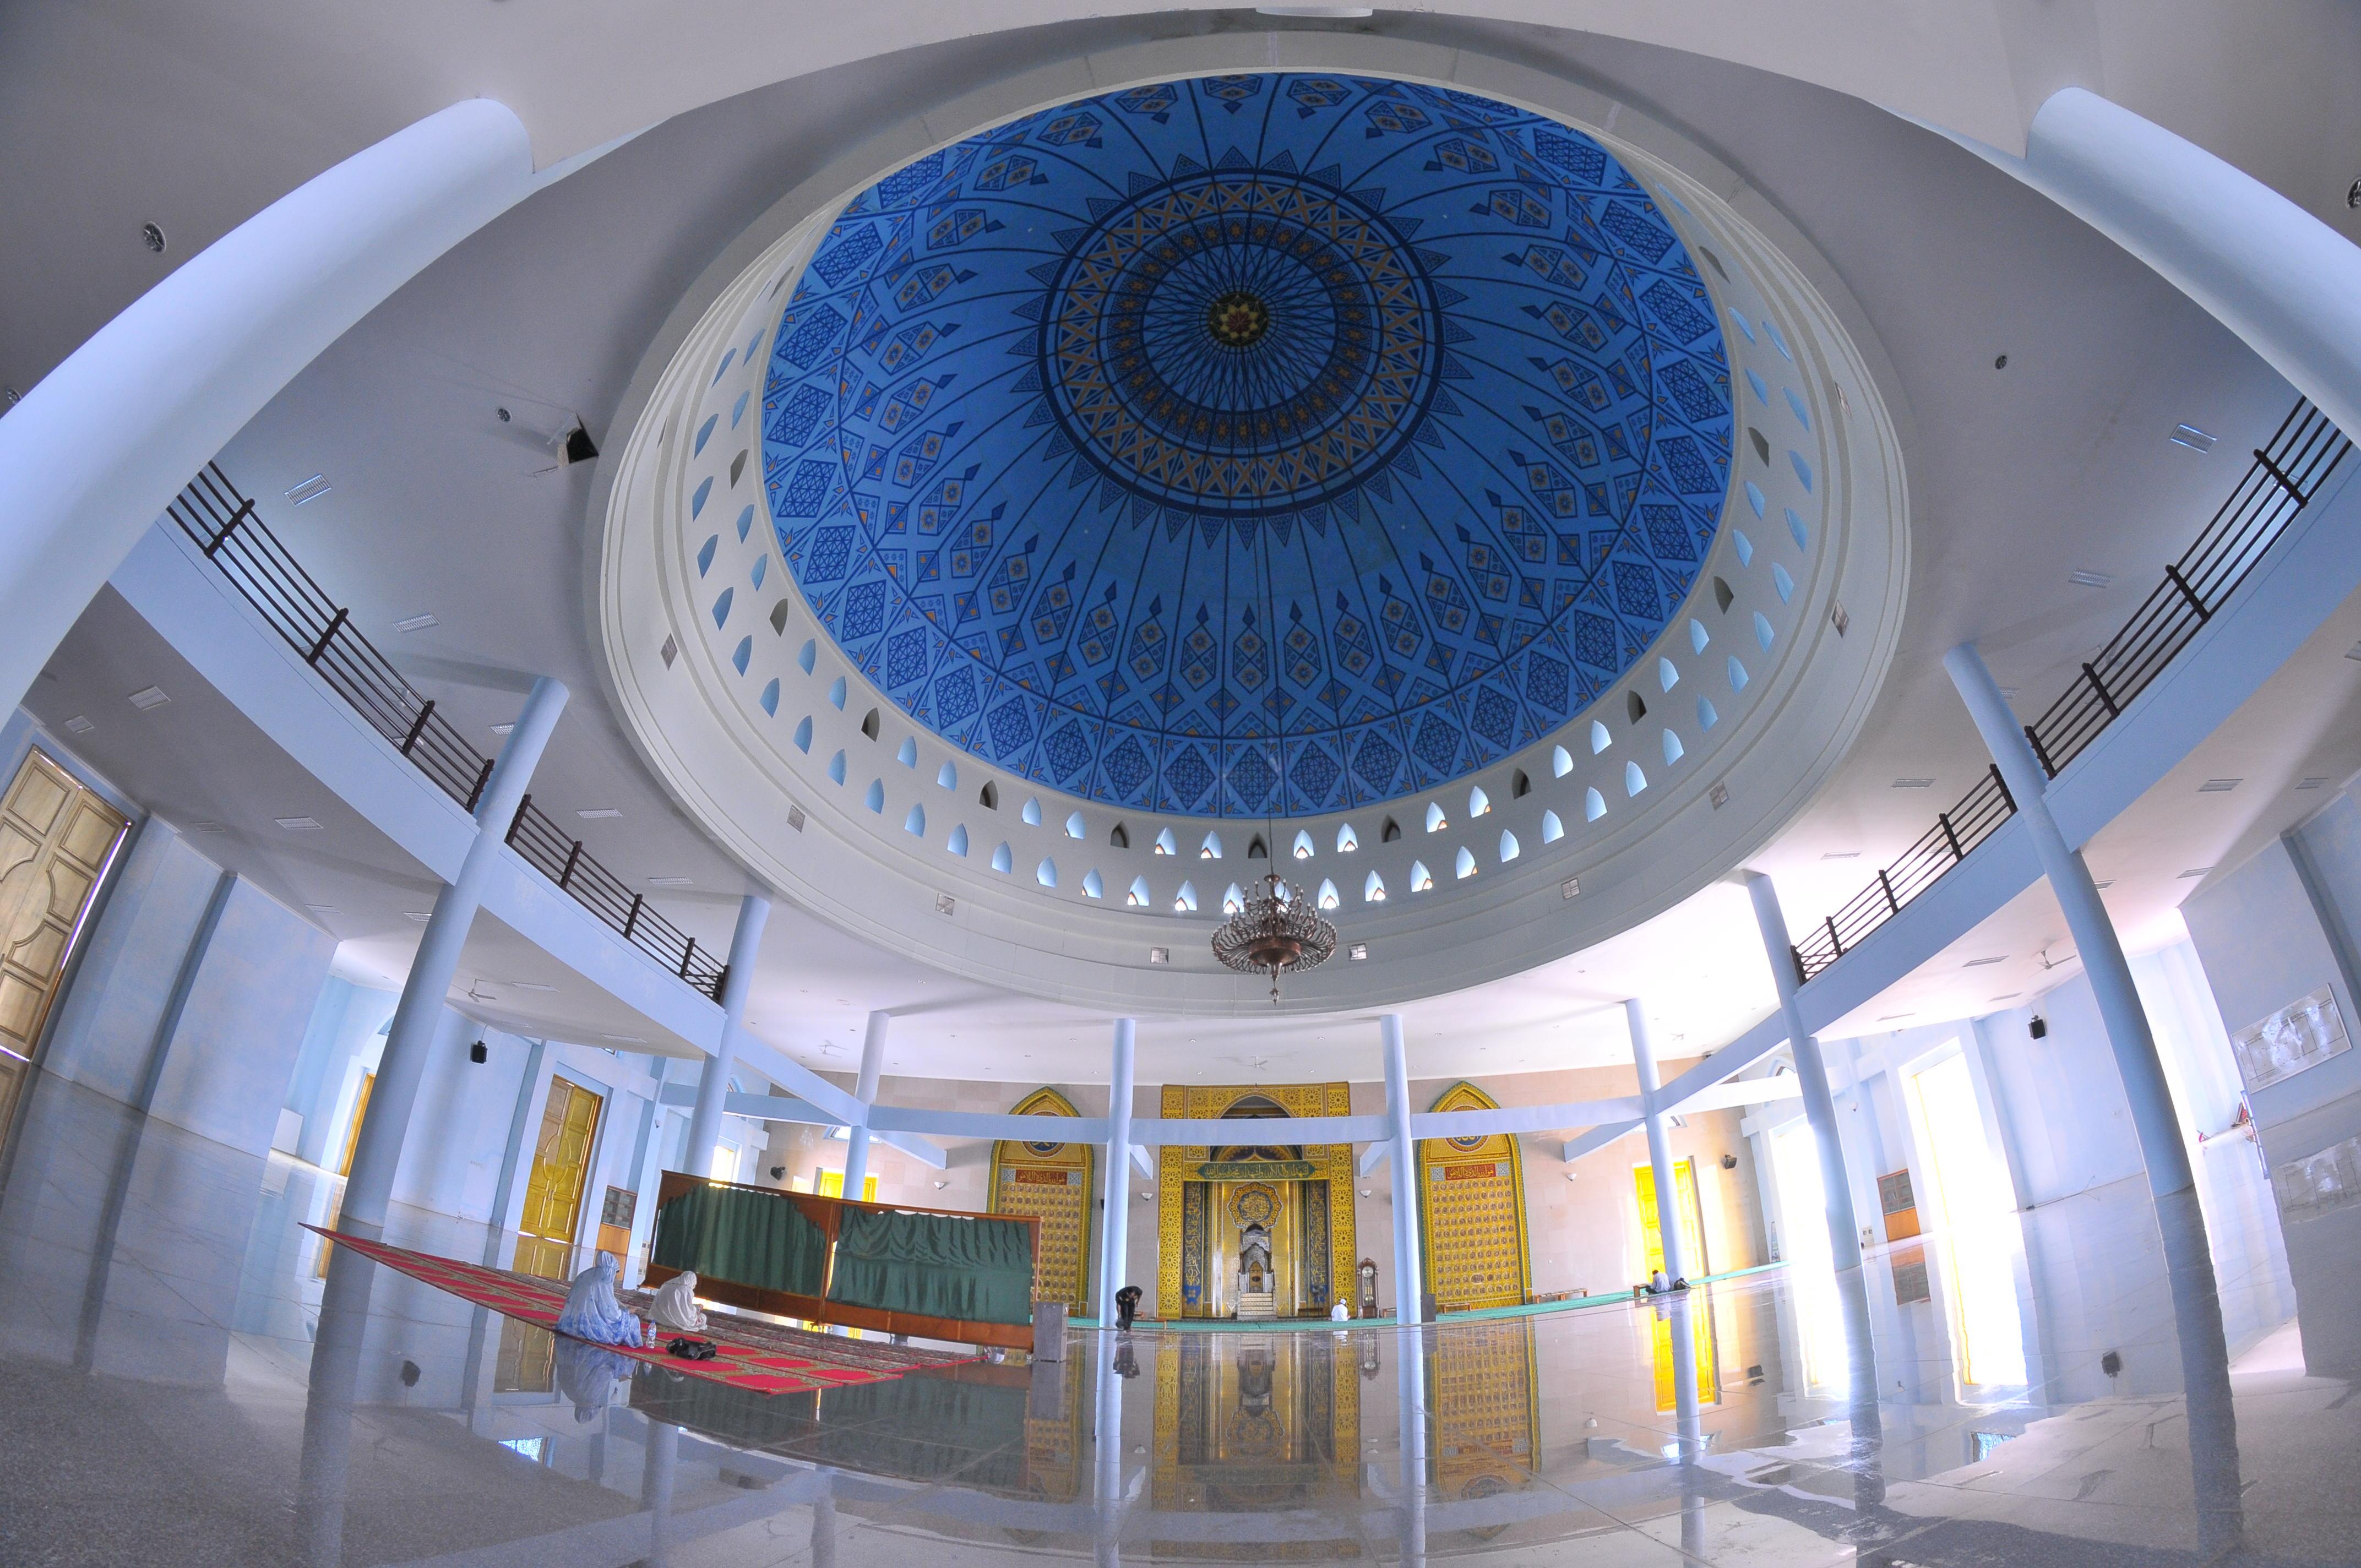 Shalat Robbi Hafzan Arsitektur Masjid Indah Raya Dompak Kota Tanjungpinang